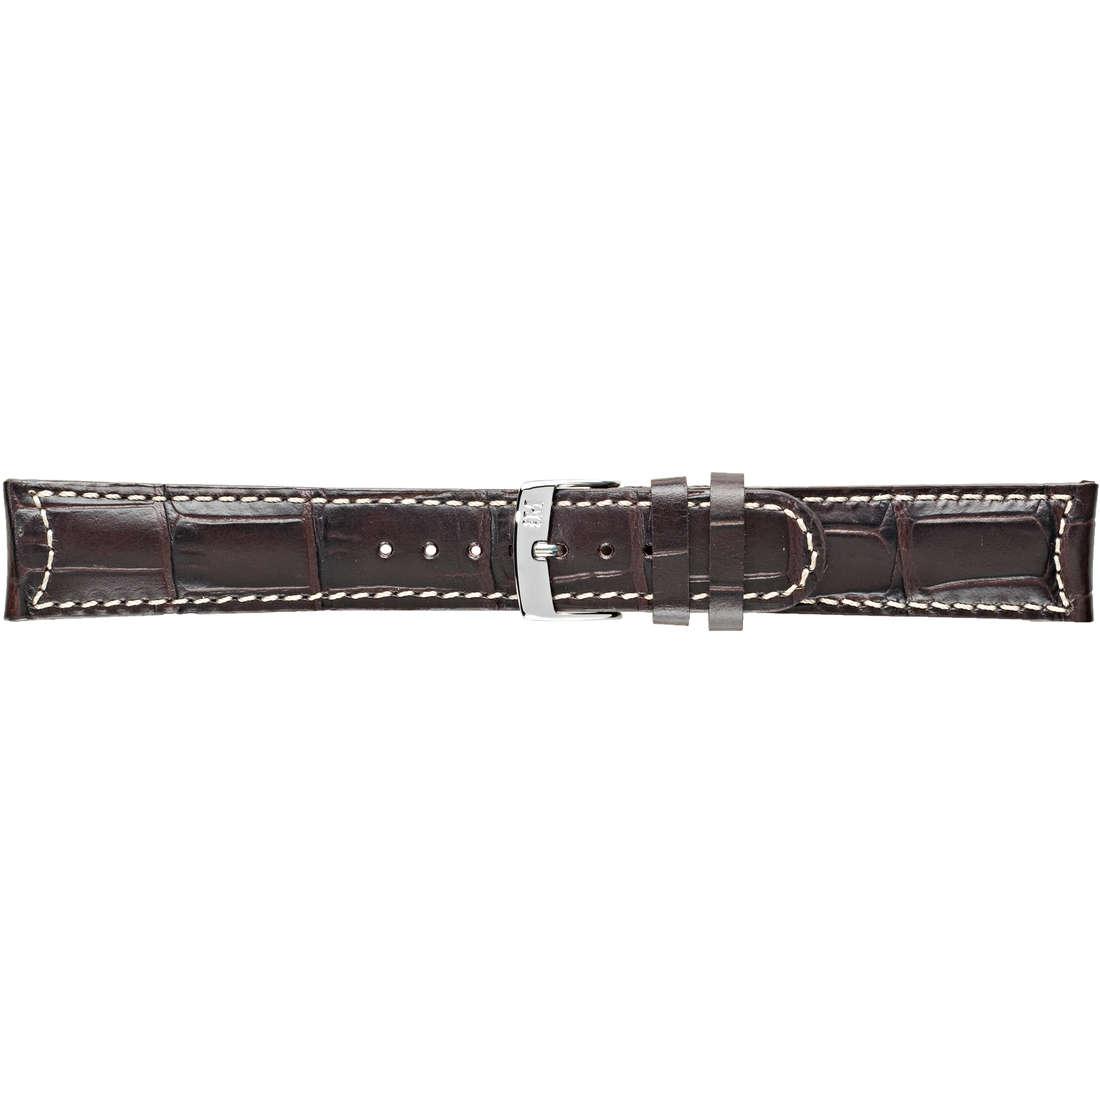 watch watch bands watch straps man Morellato Manufatti A01U3882A59030CR24